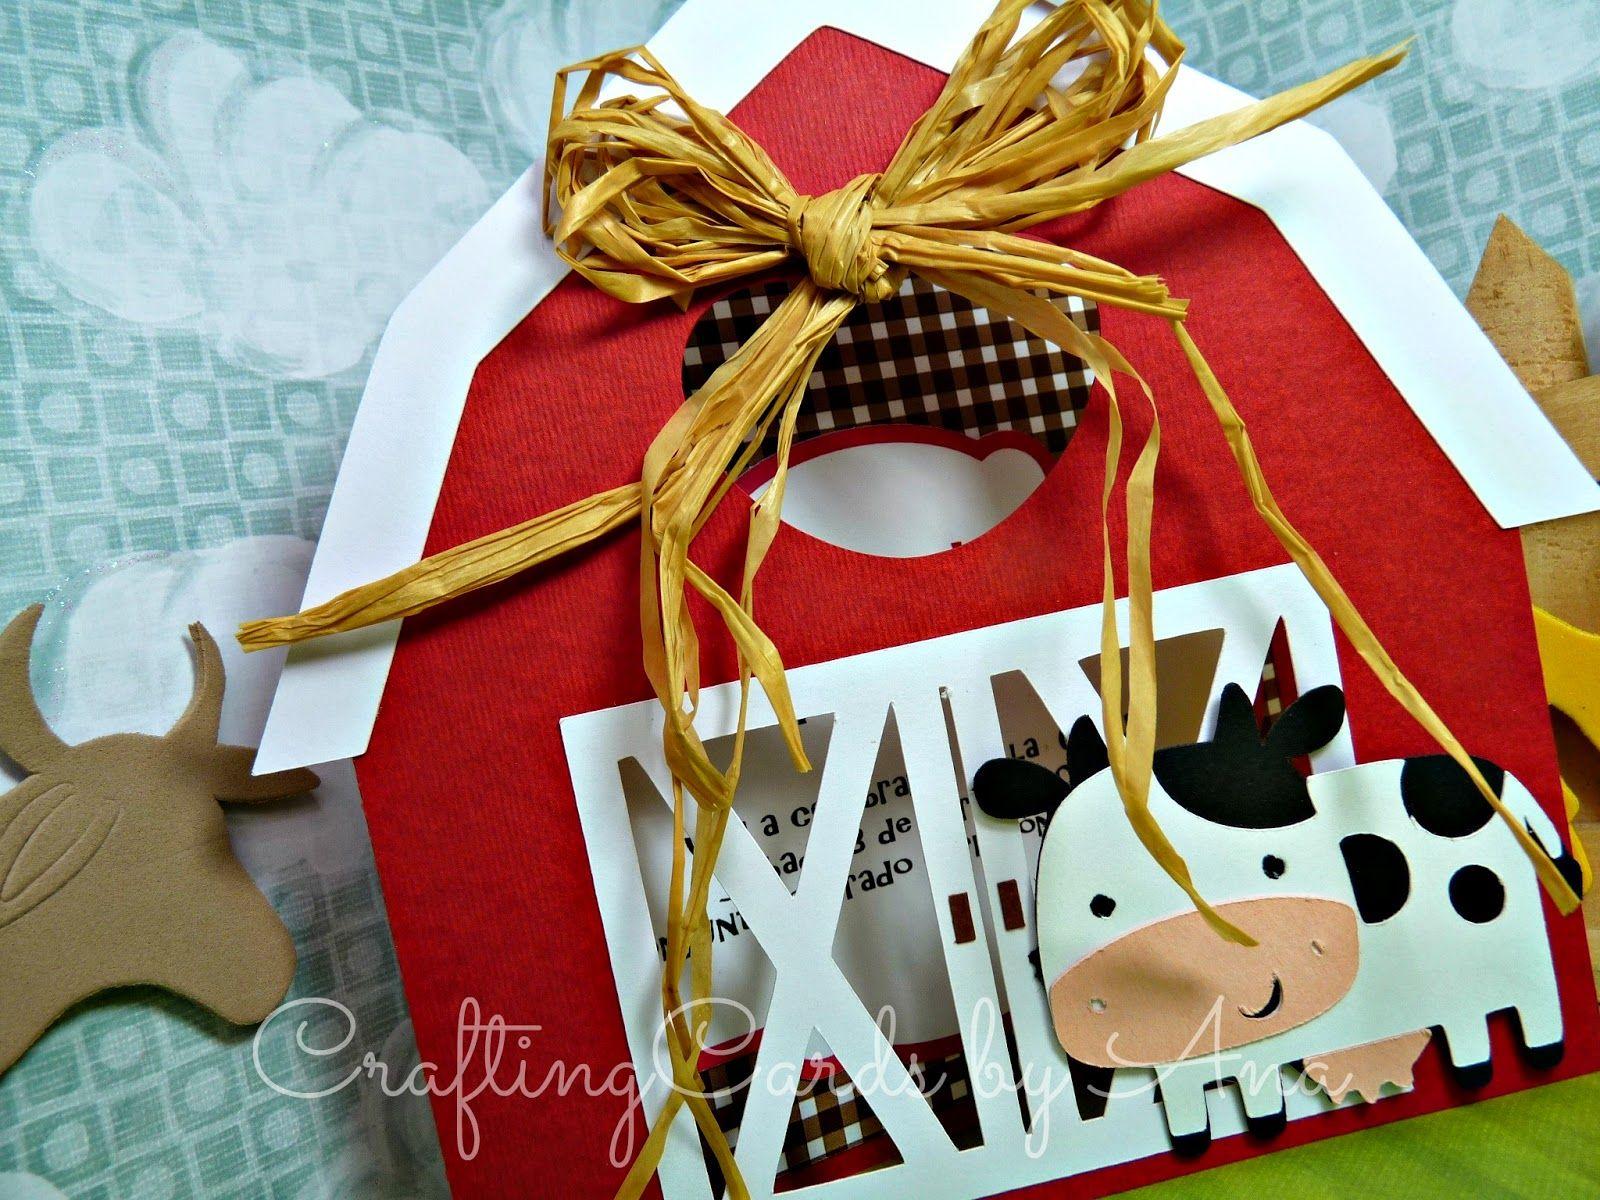 Tarjetas De Cumpleaños La Granja Para Mandar Por Whatsapp 5 HD Wallpapers cumple Pinterest